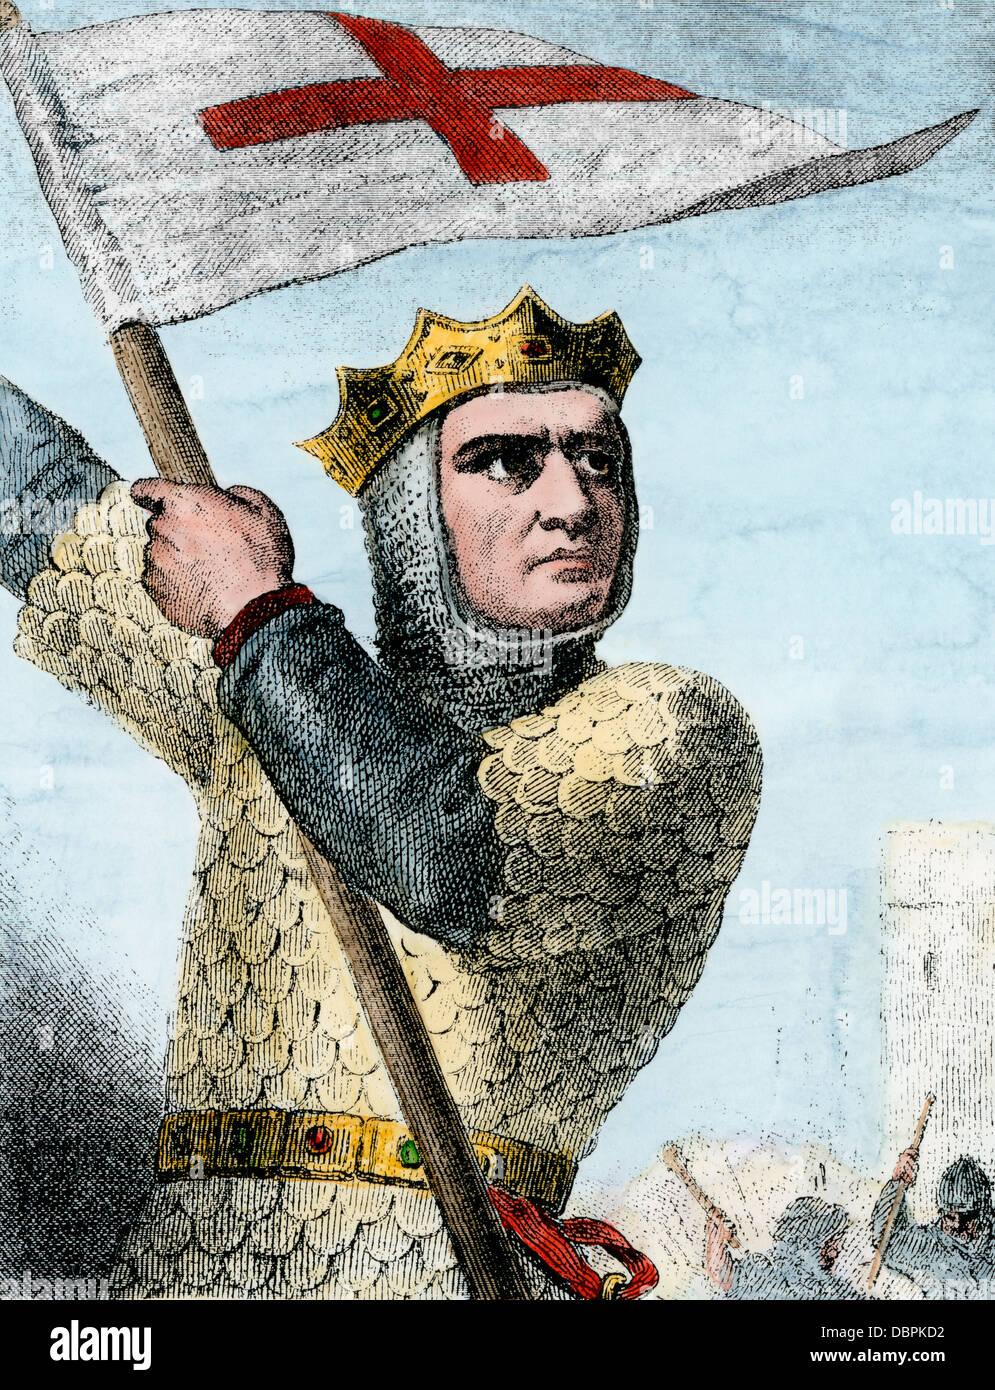 Gottfried von Bouillon in der Ersten Kreuzzug, 1096 N.CHR. Handkolorierter Holzschnitt Stockbild